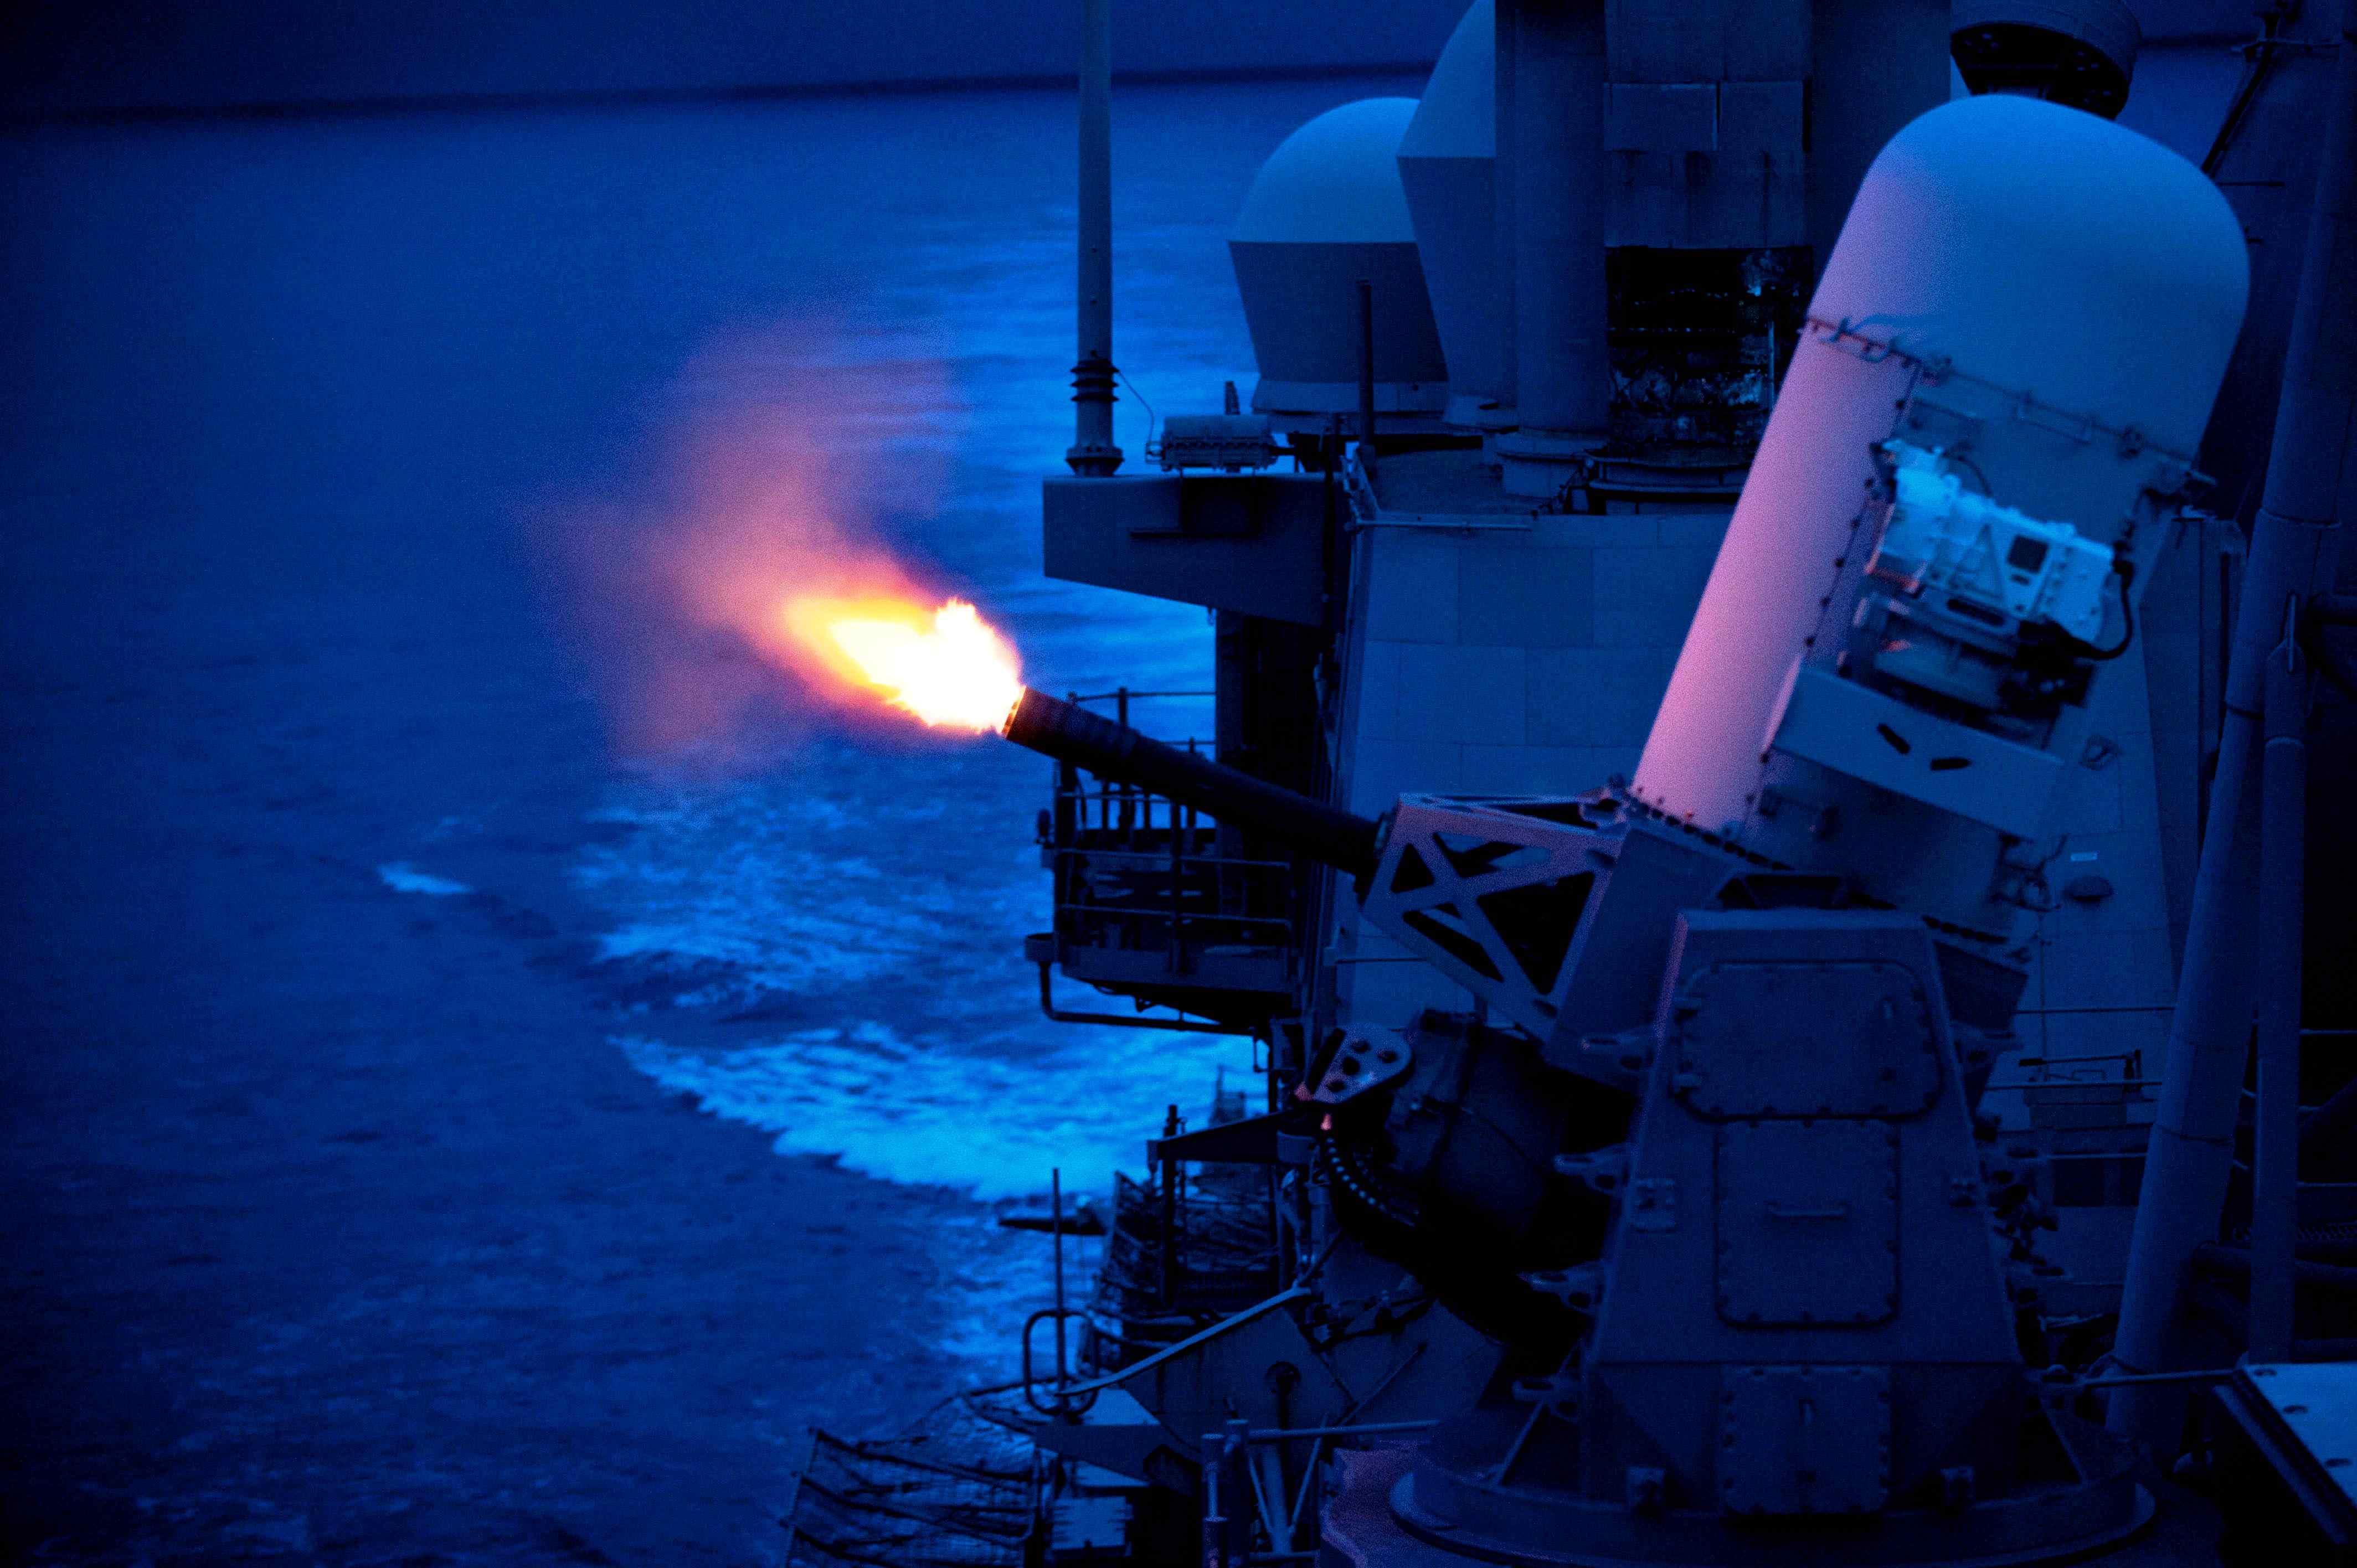 USS Cowpens - стрельба Вулкана.jpg